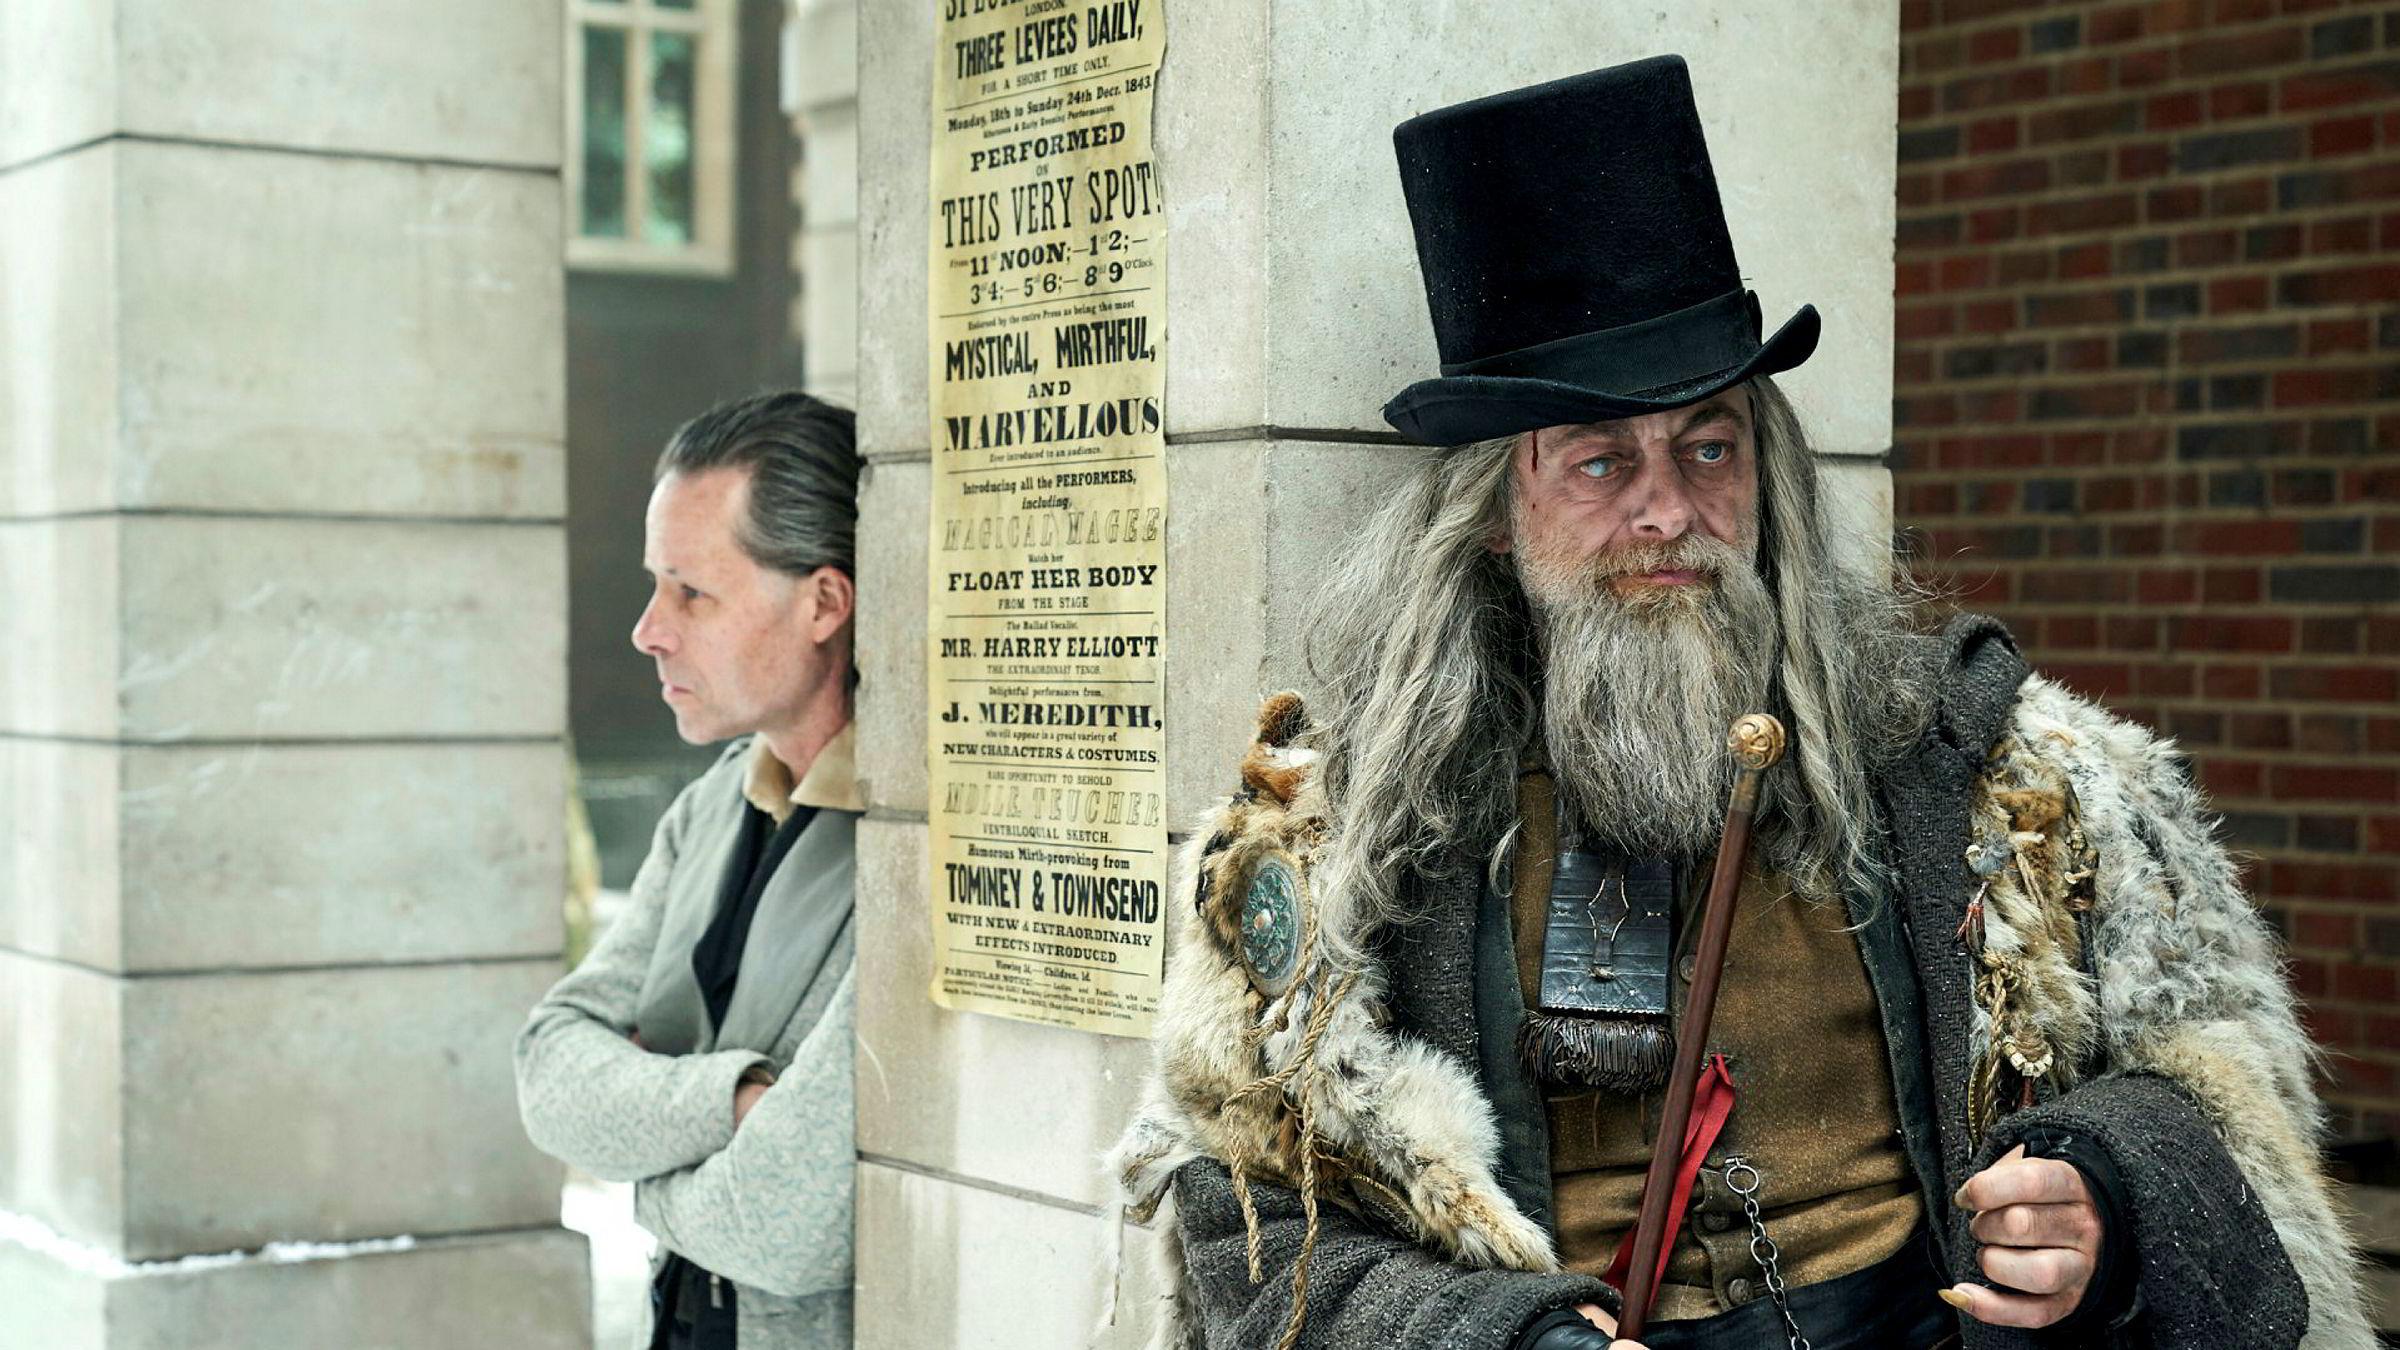 I 1843 skrev Charles Dickens «A Christmas Carol». Her fra filmatiseringen der Andy Serkis har rollen som «Fortidens ånd» og Guy Pearce spiller Ebenezer Scrooge (til venstre).